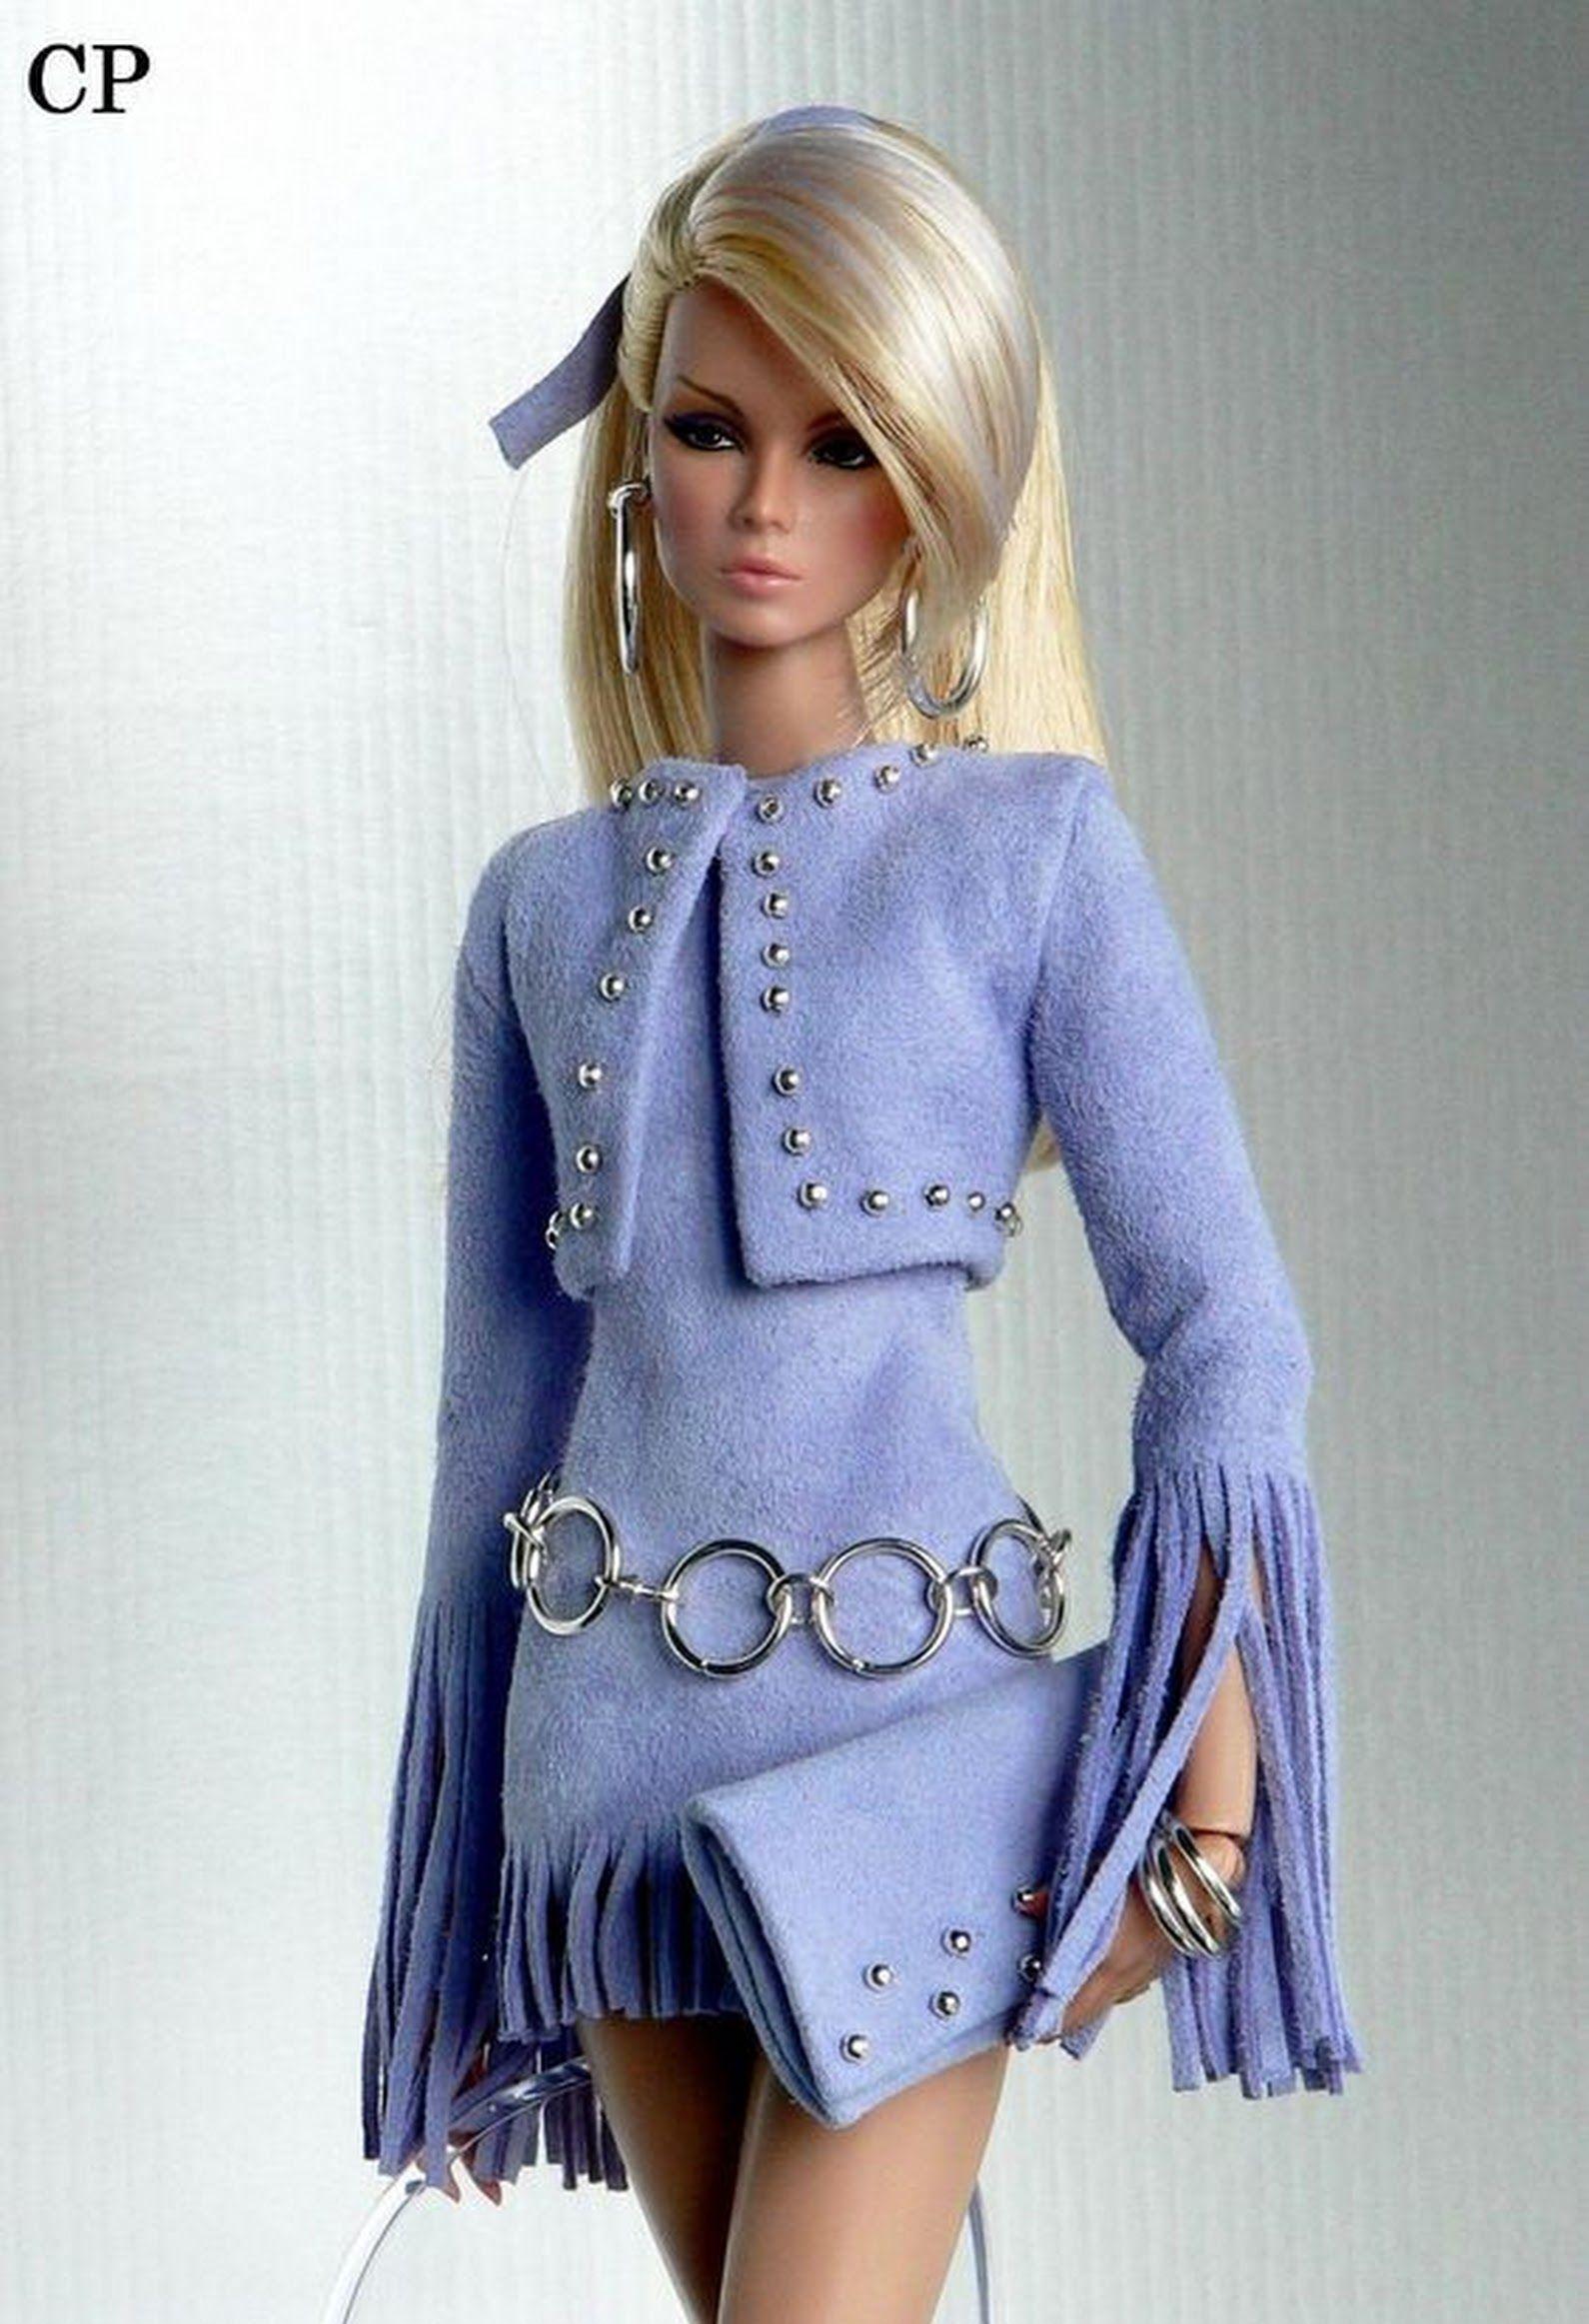 Altro Bambole Realistic Barbie Fashion Play Great Varieties